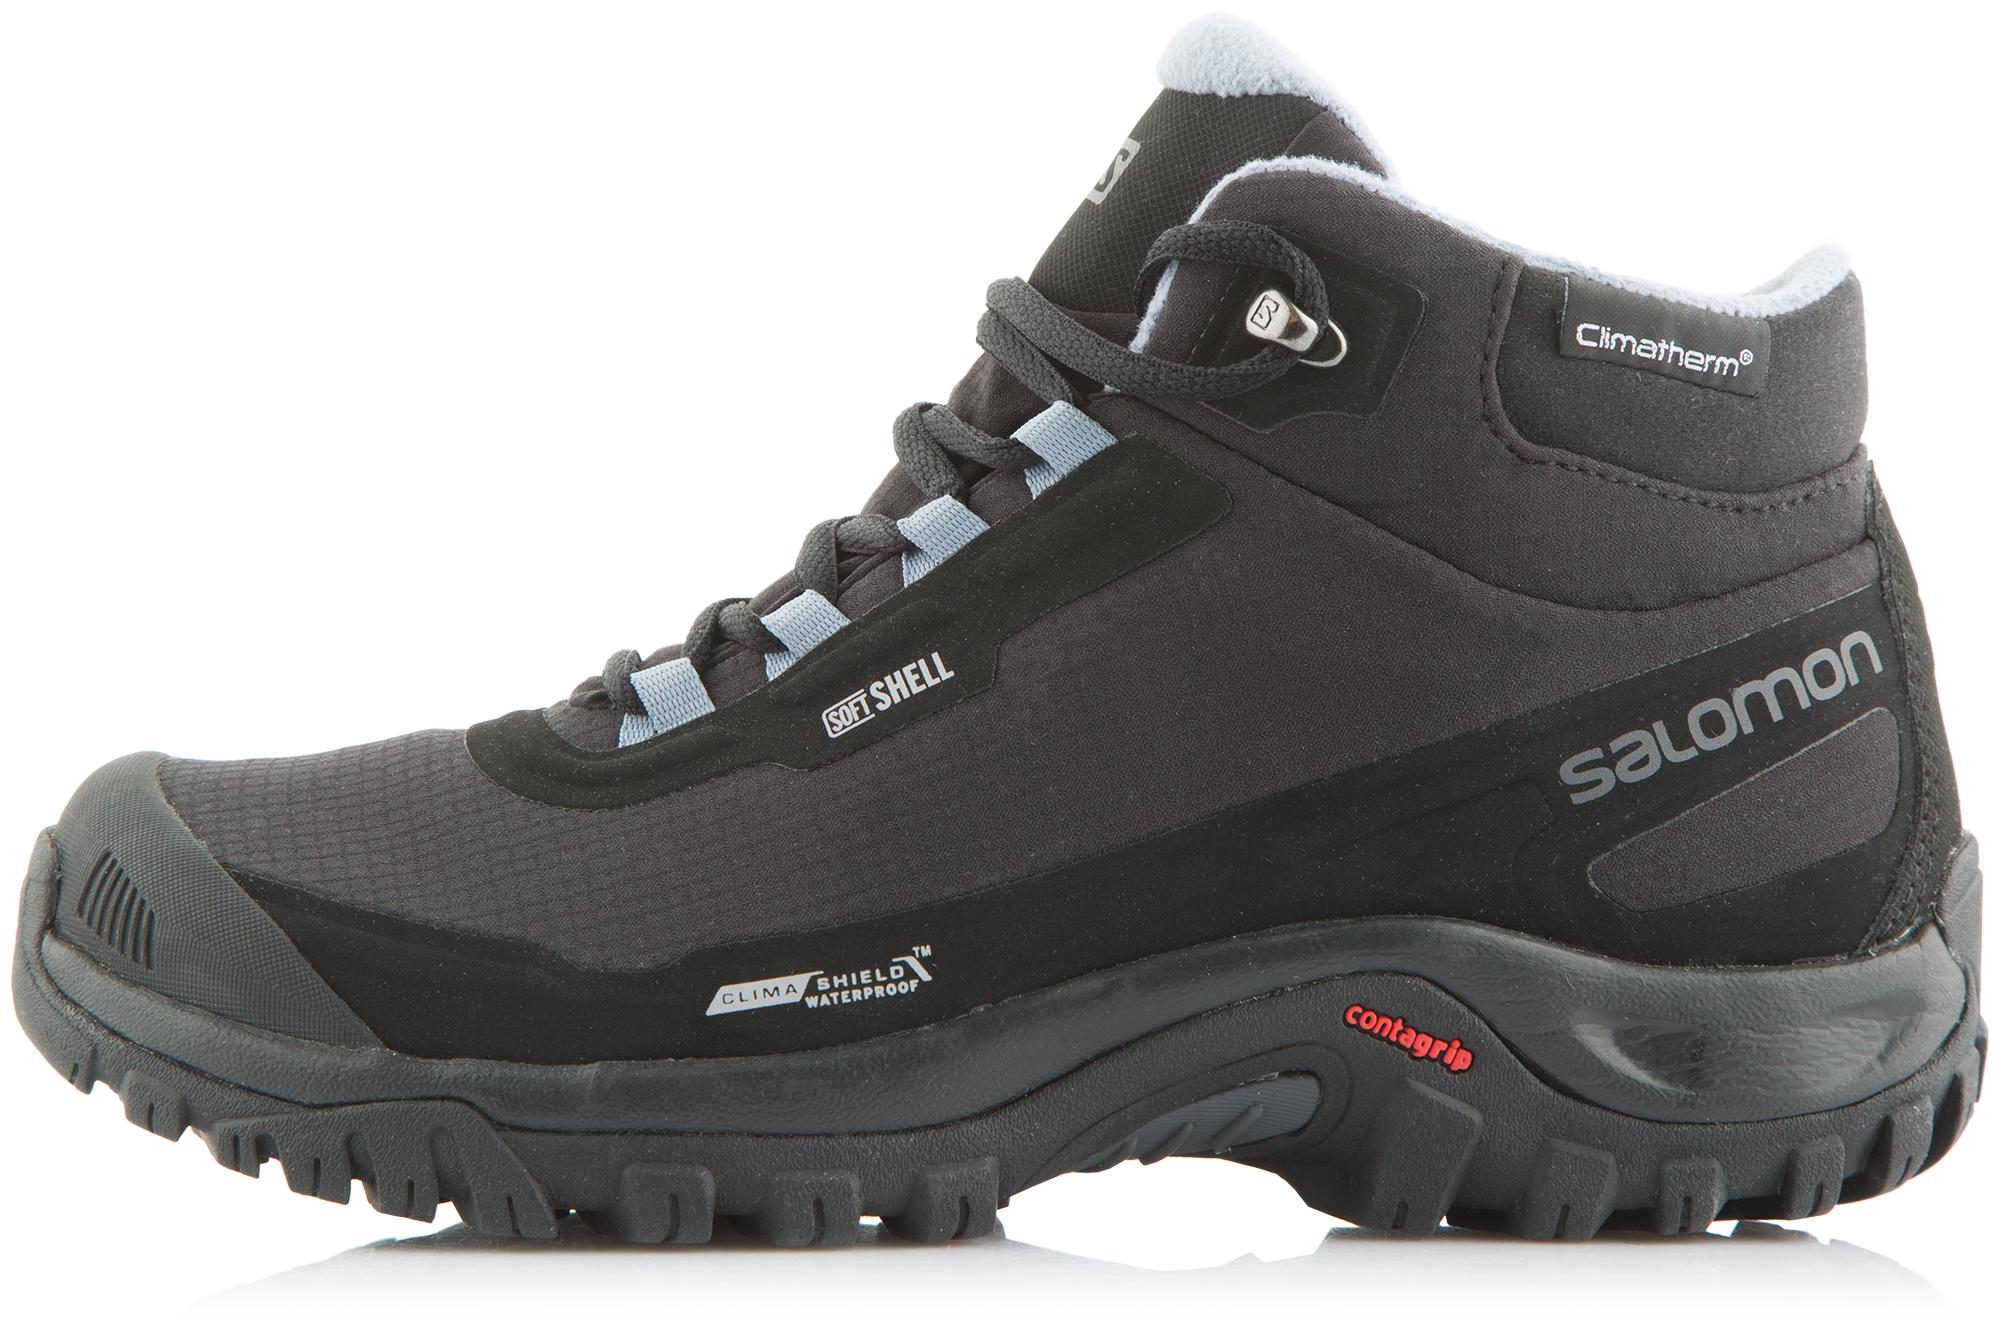 Salomon Ботинки утепленные женские Salomon Shelter ботинки salomon ботинки shoes shelter spikes cs wp black bk ptr